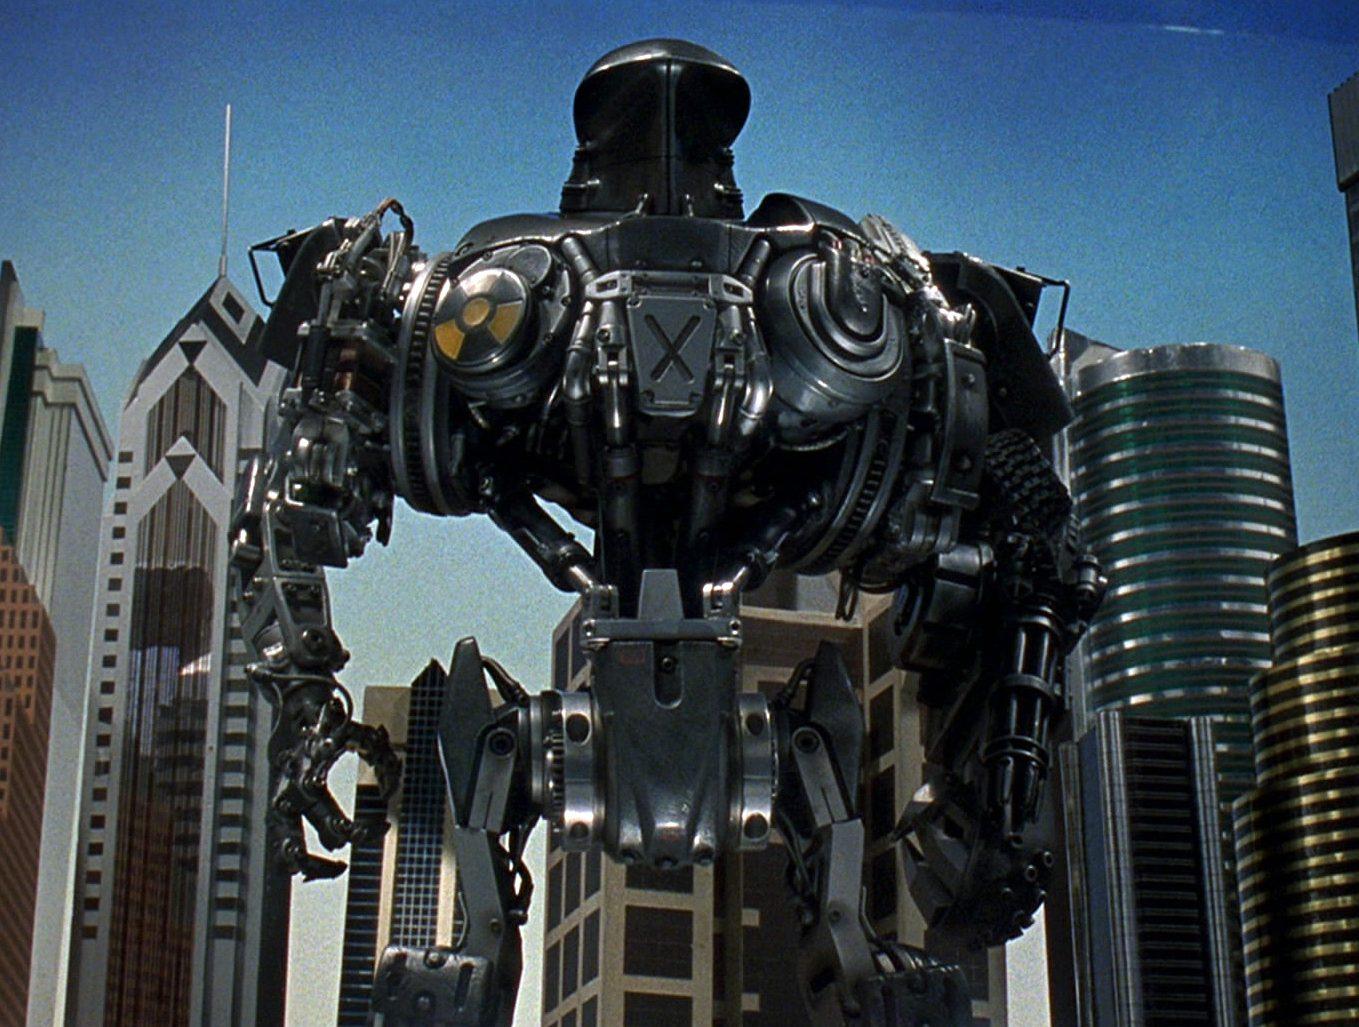 robocop 2 pic 4 e1607443865287 20 Futuristic Facts About RoboCop 2